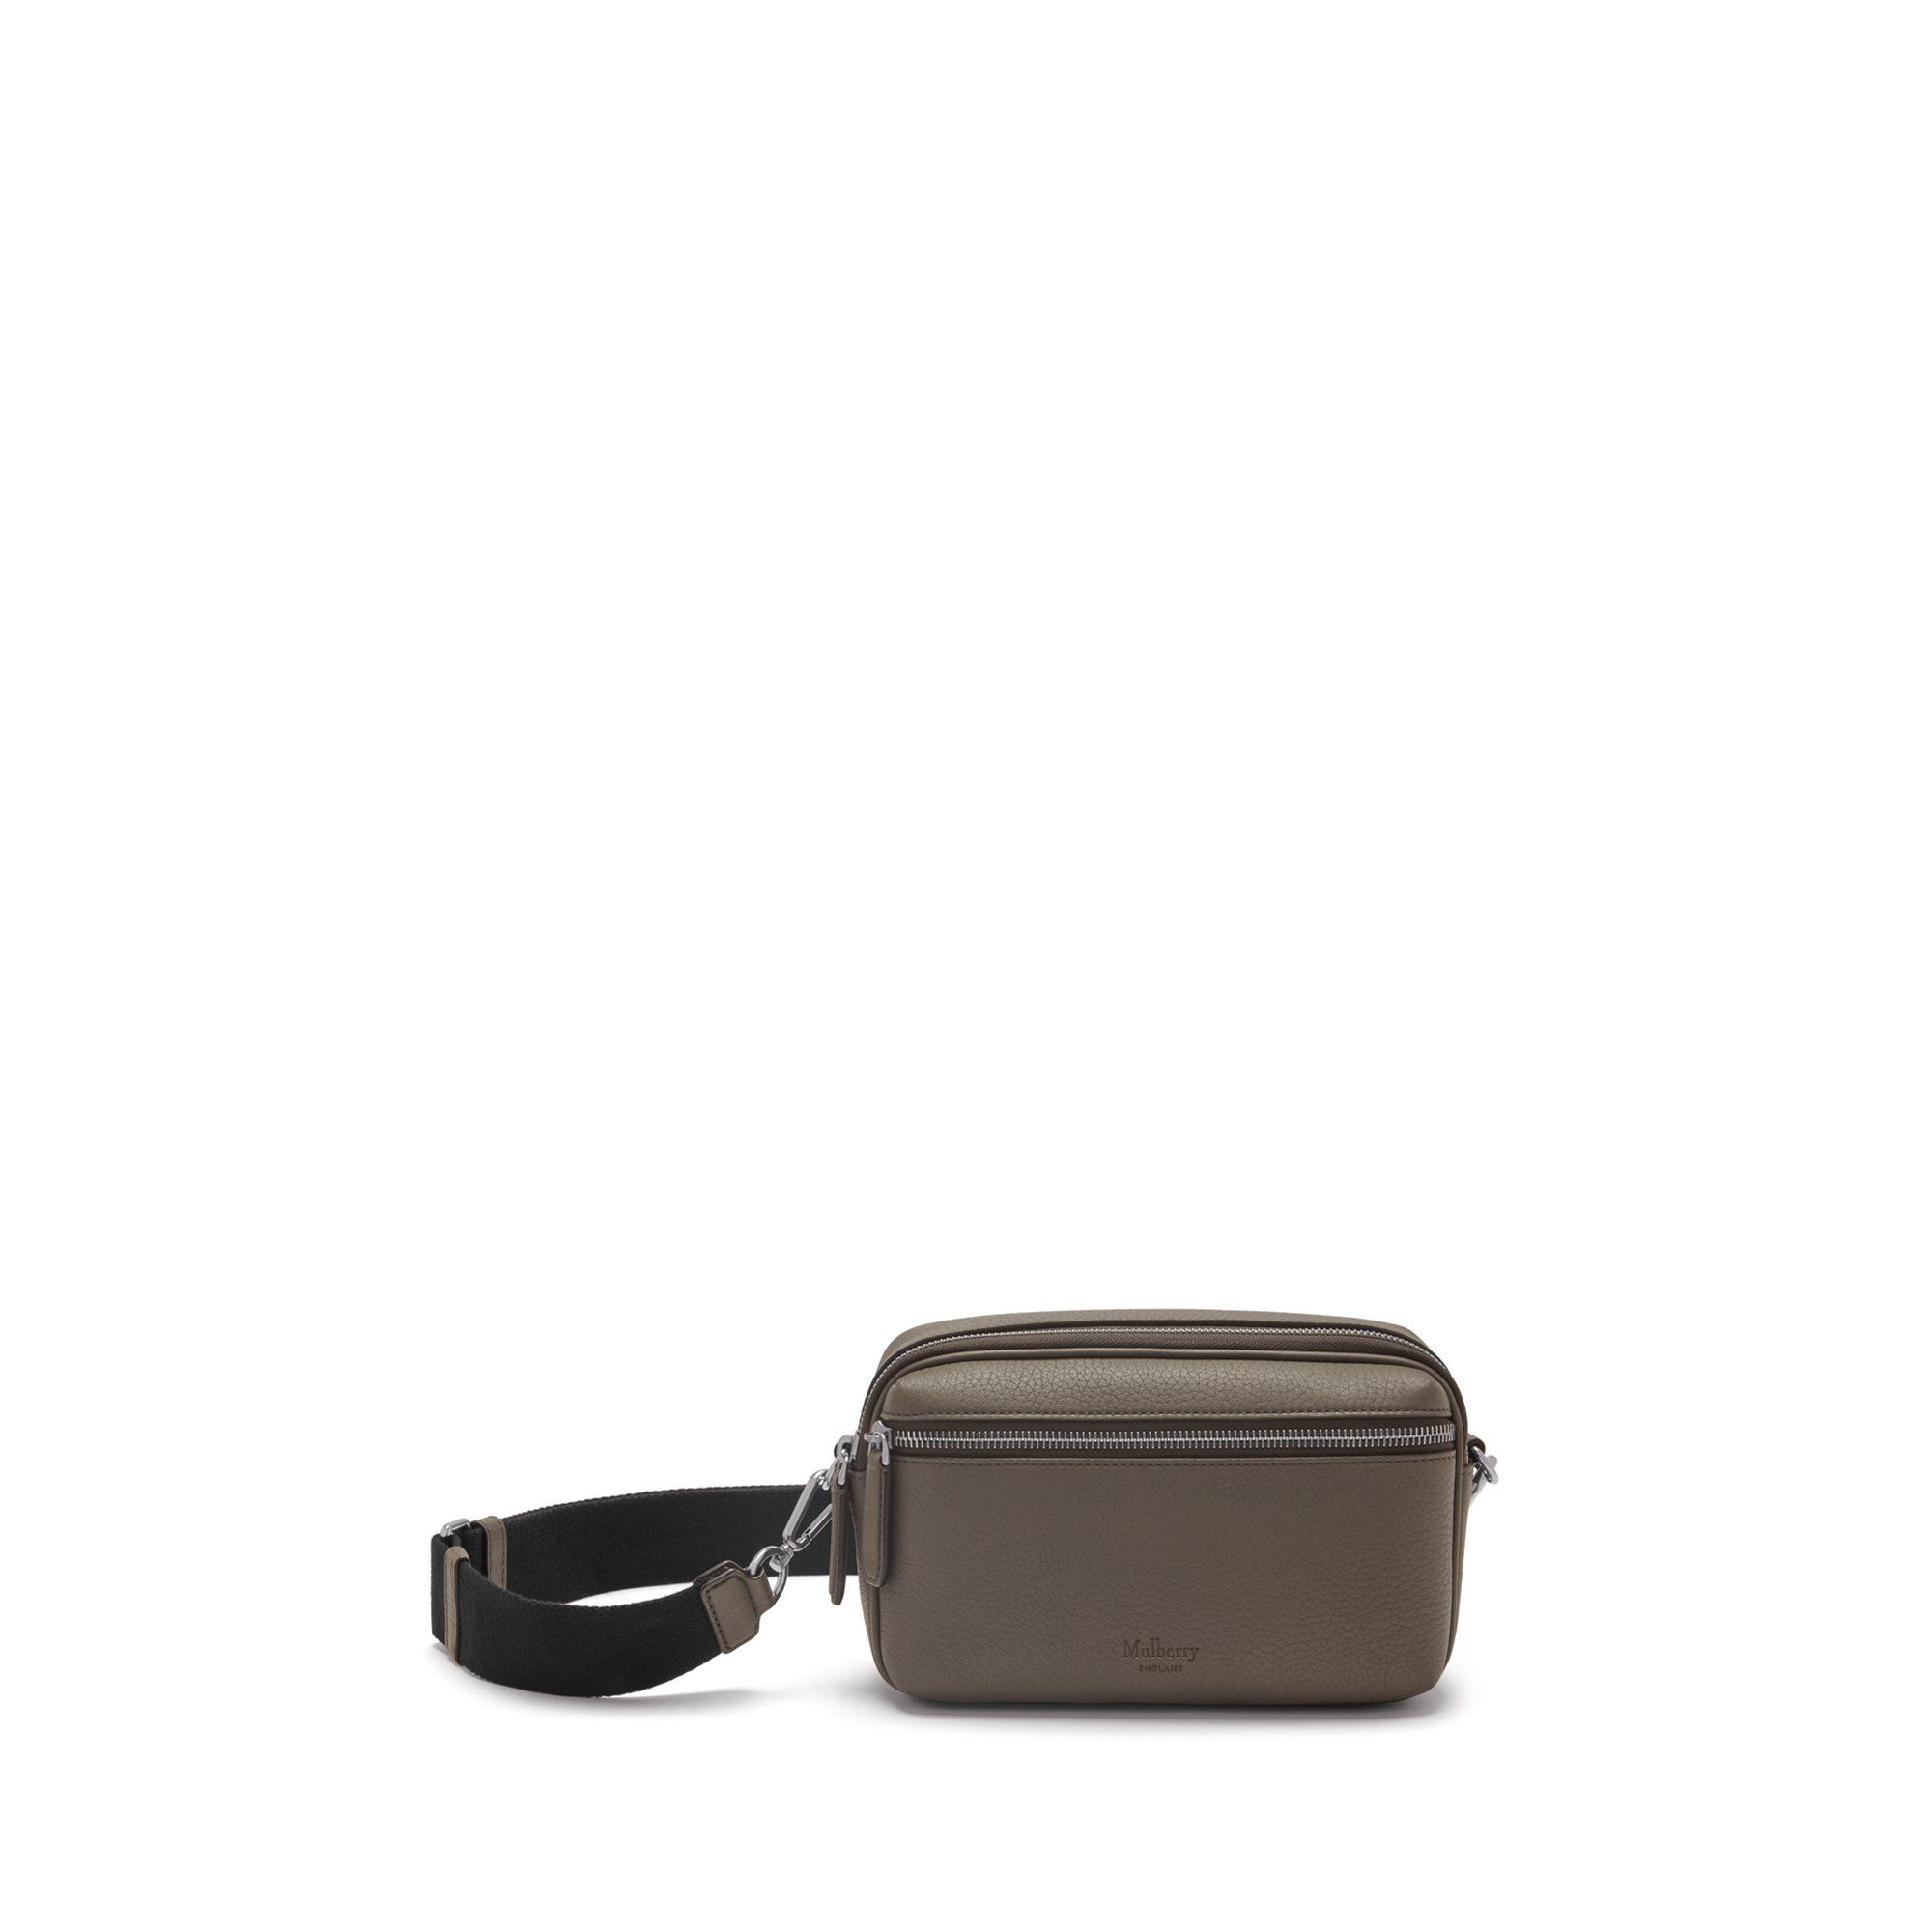 e93089634 Messenger Bags | Men's Bags | Men | Mulberry